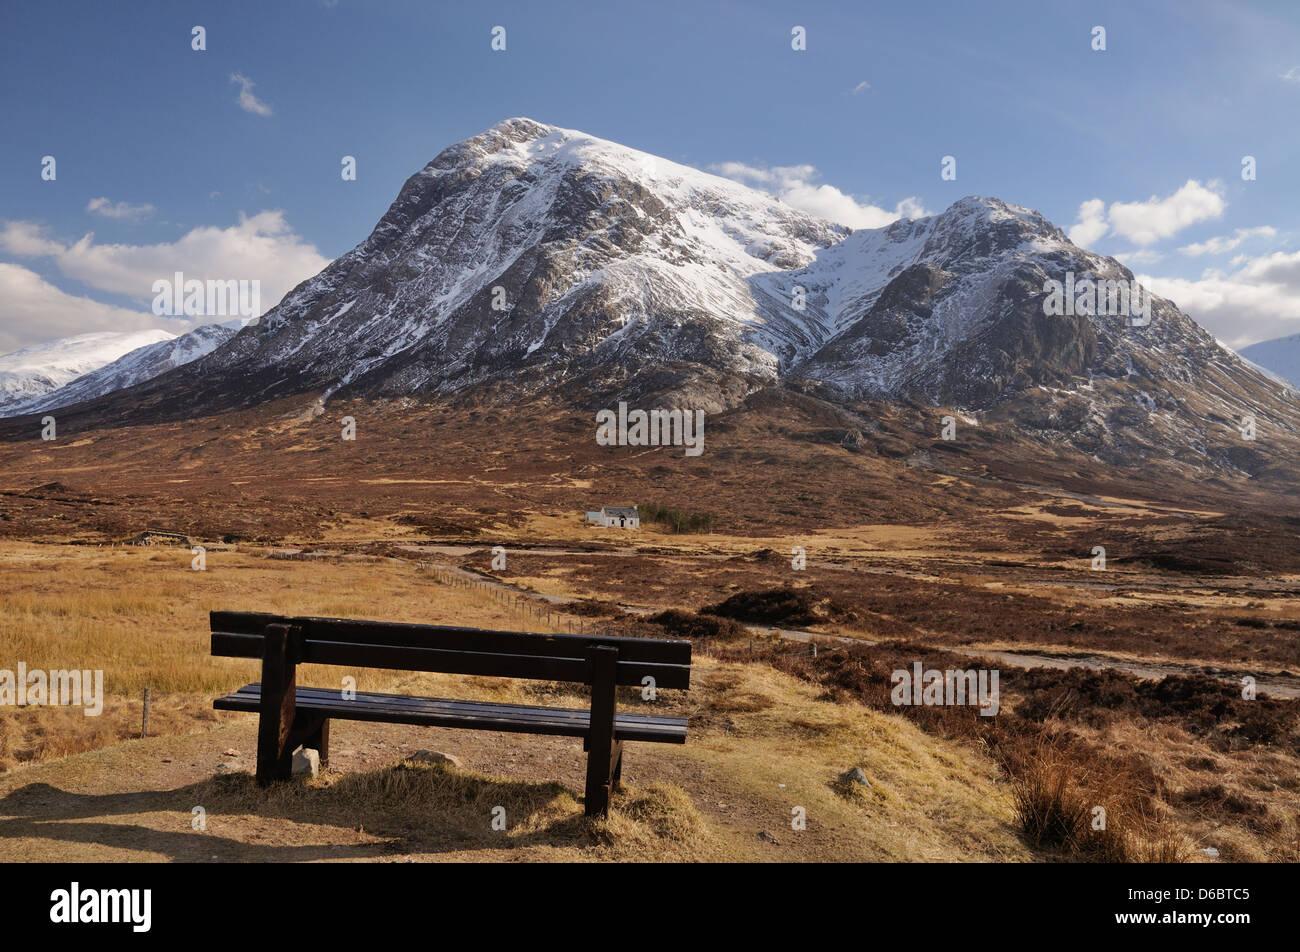 Viewpoint of Buachaille Etive Mor, Glencoe, Scottish Highlands - Stock Image